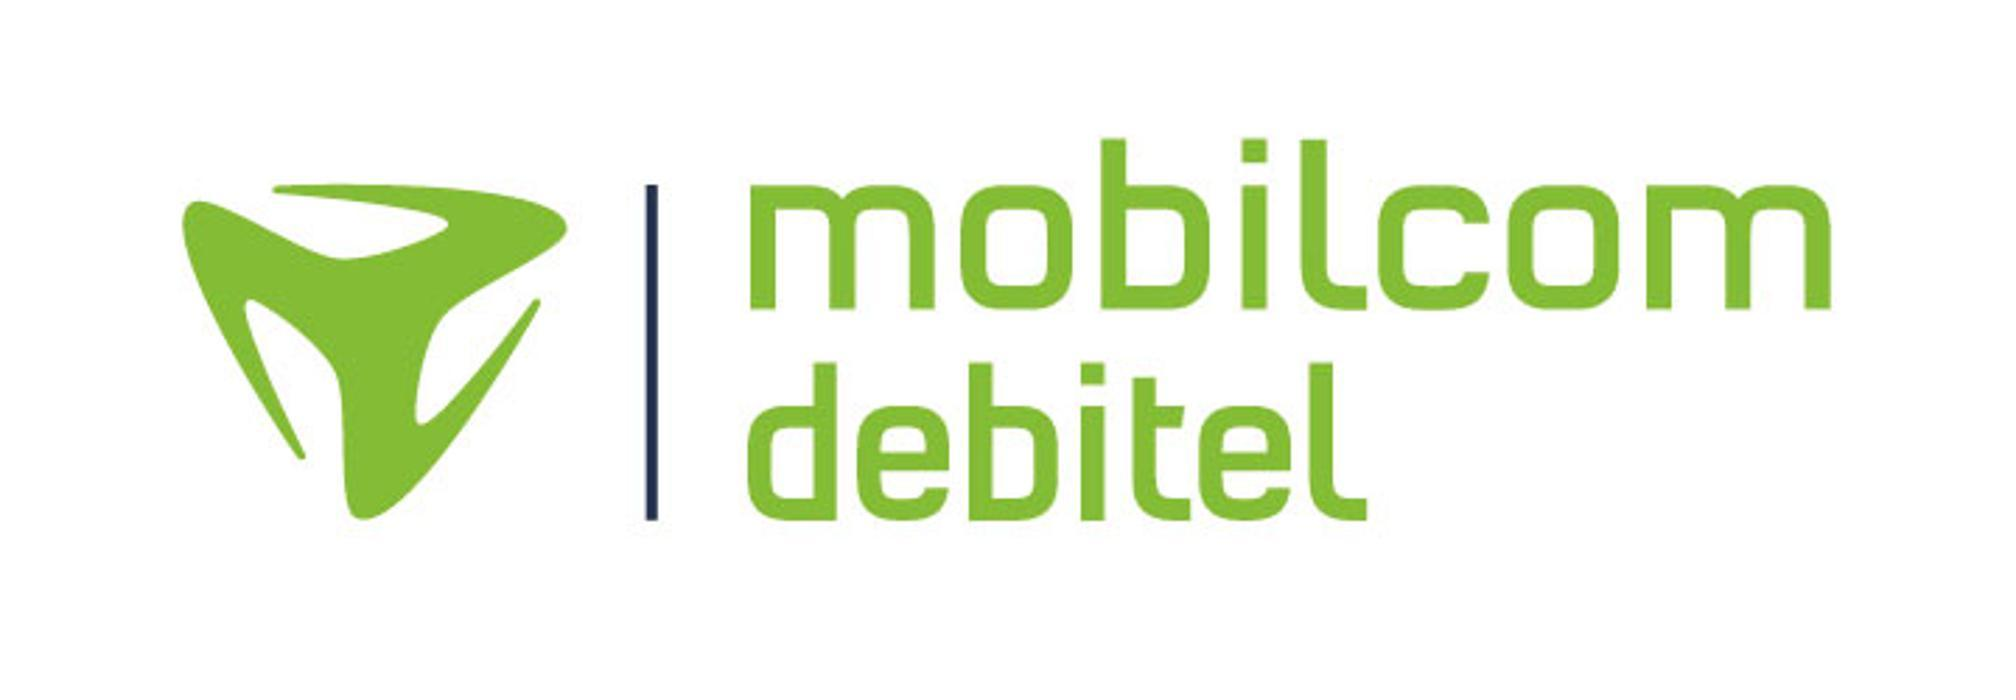 mobilcom-debitel, Schulstr. in Stuttgart